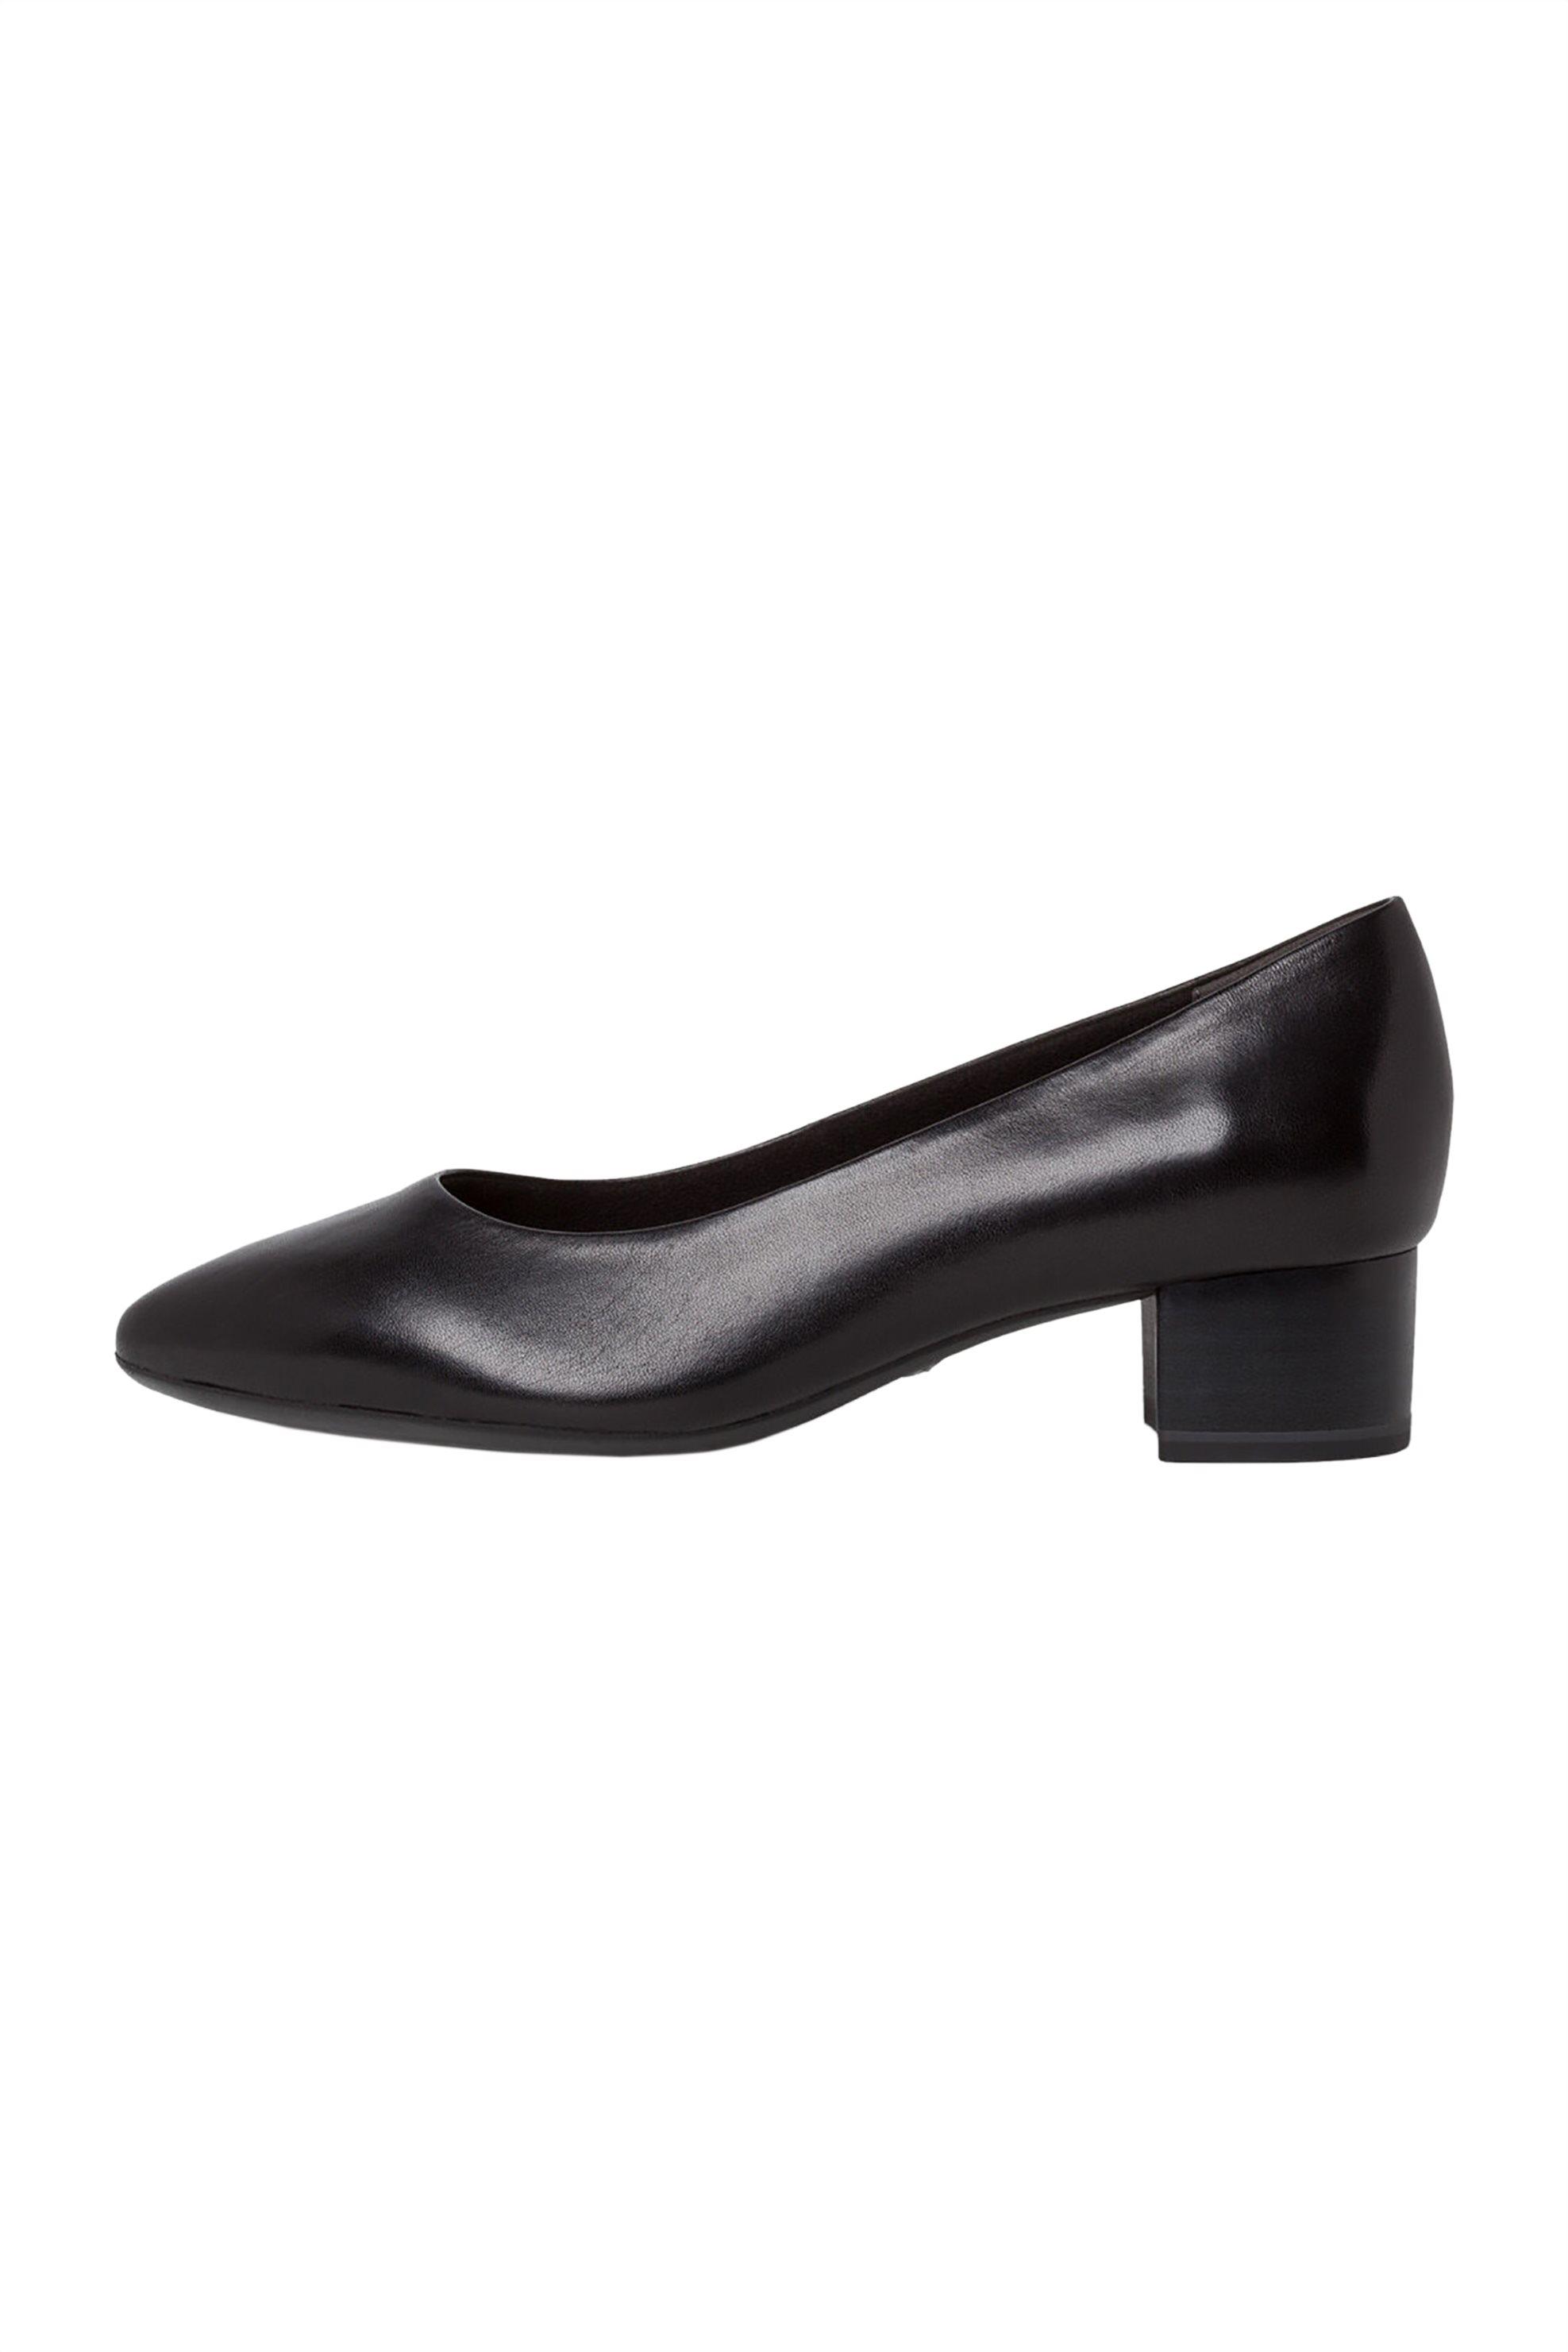 Tamaris γυναικείες γόβες με χαμηλό τακούνι – 1-1-22300-25 – Μαύρο